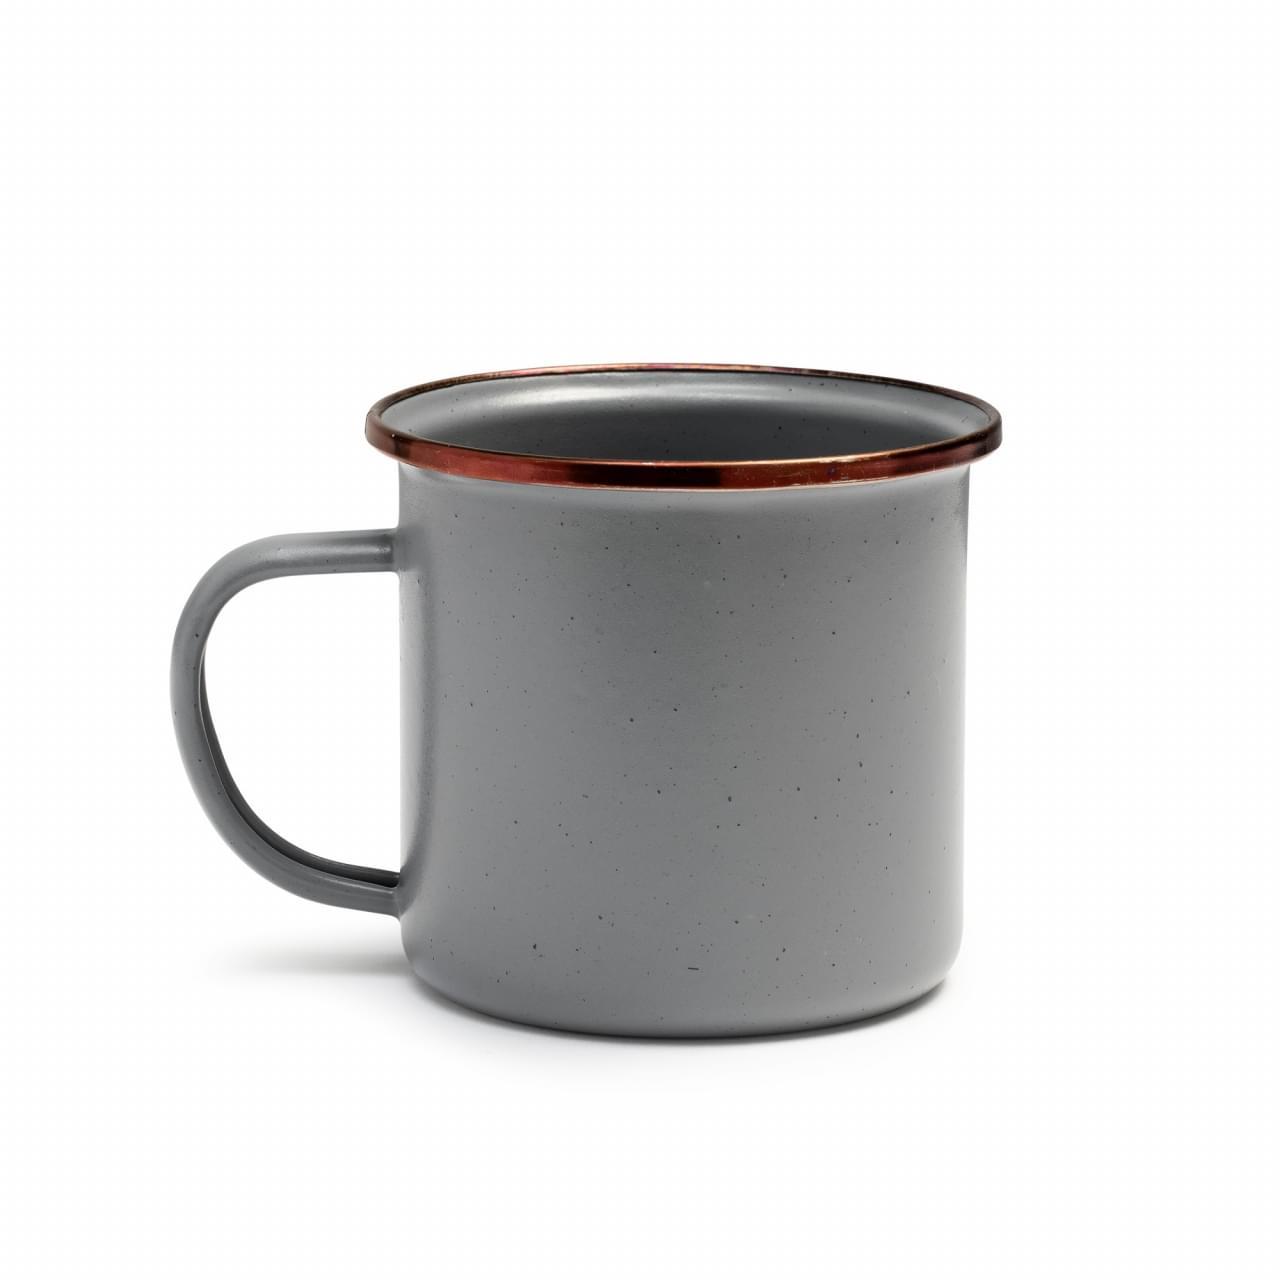 Barebones Barebones Enamel Espresso Kop per 2 St. Stone Gray